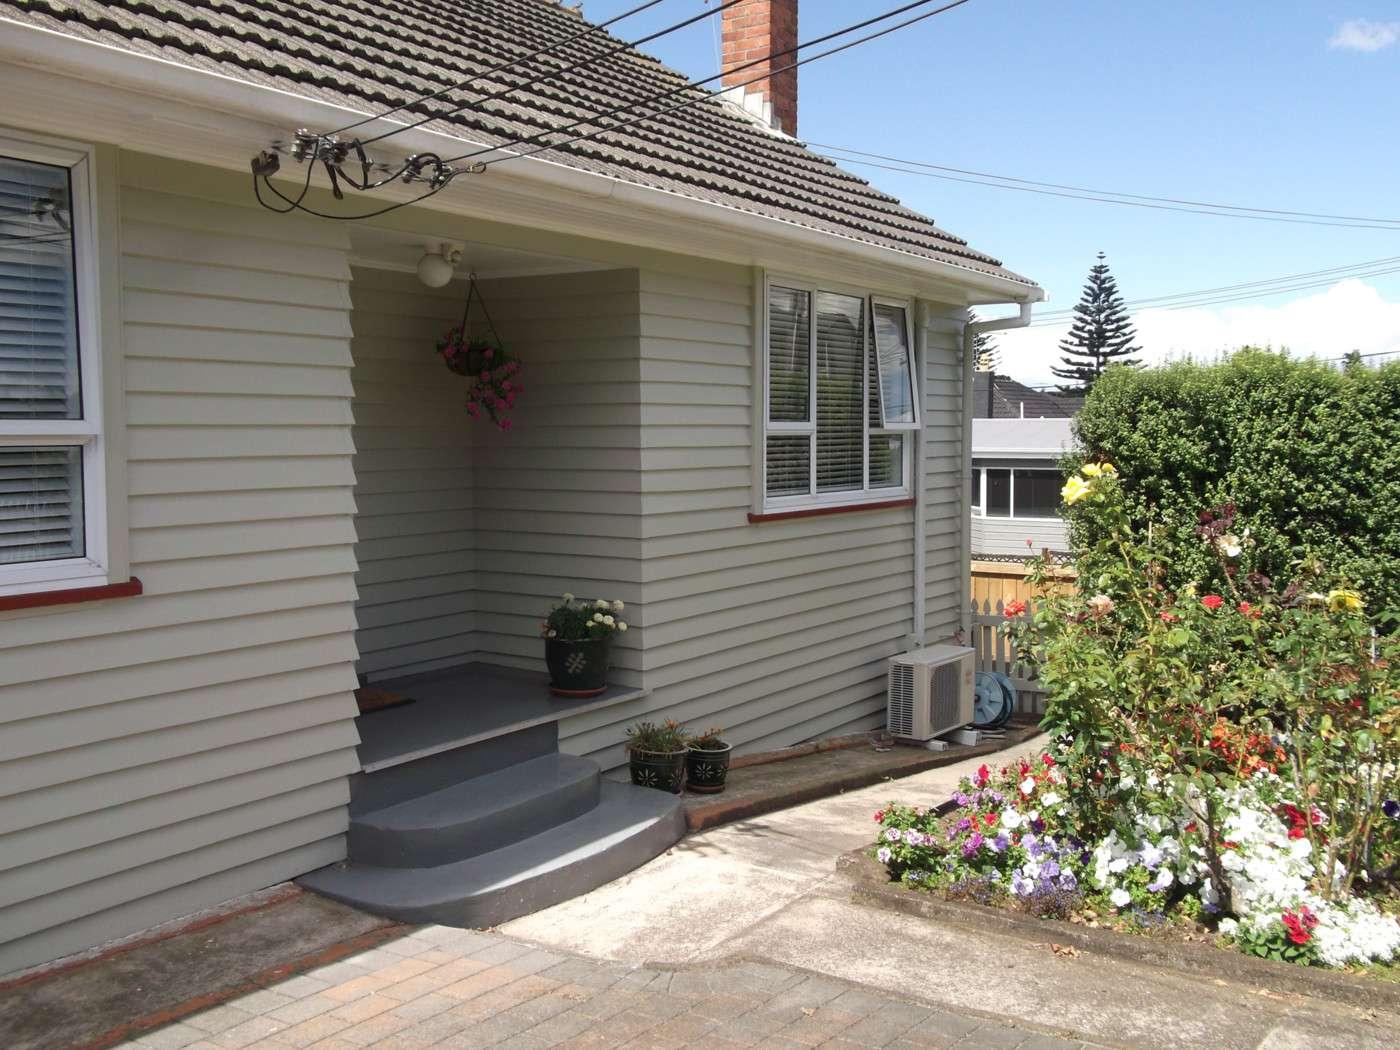 1/36 Ireland Road, PANMURE, Auckland City 1072